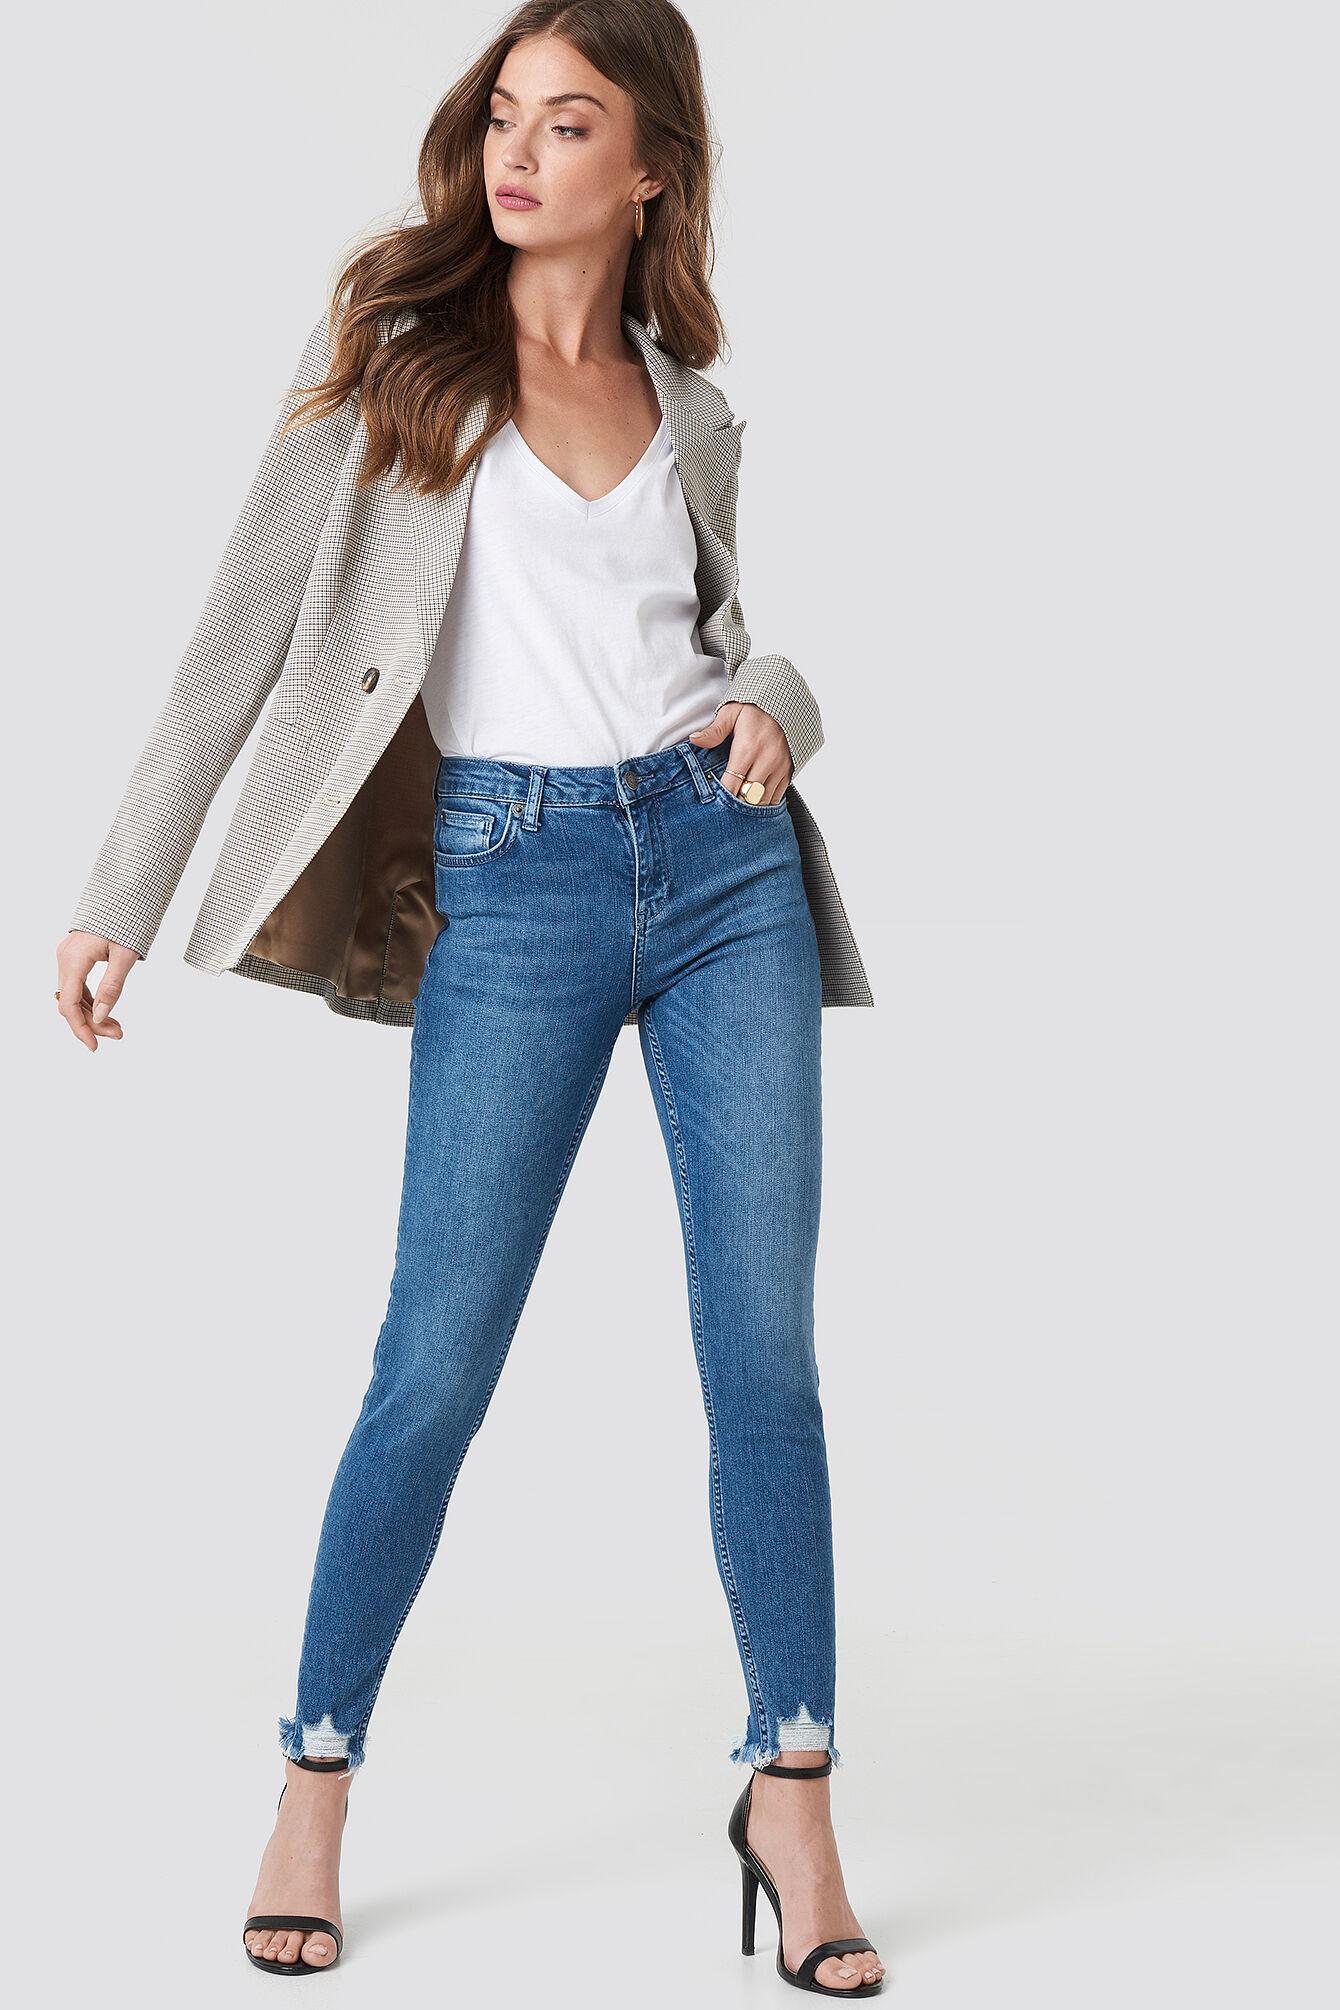 Rut&Circle Victoria Destroyed Hem Jeans - Blue